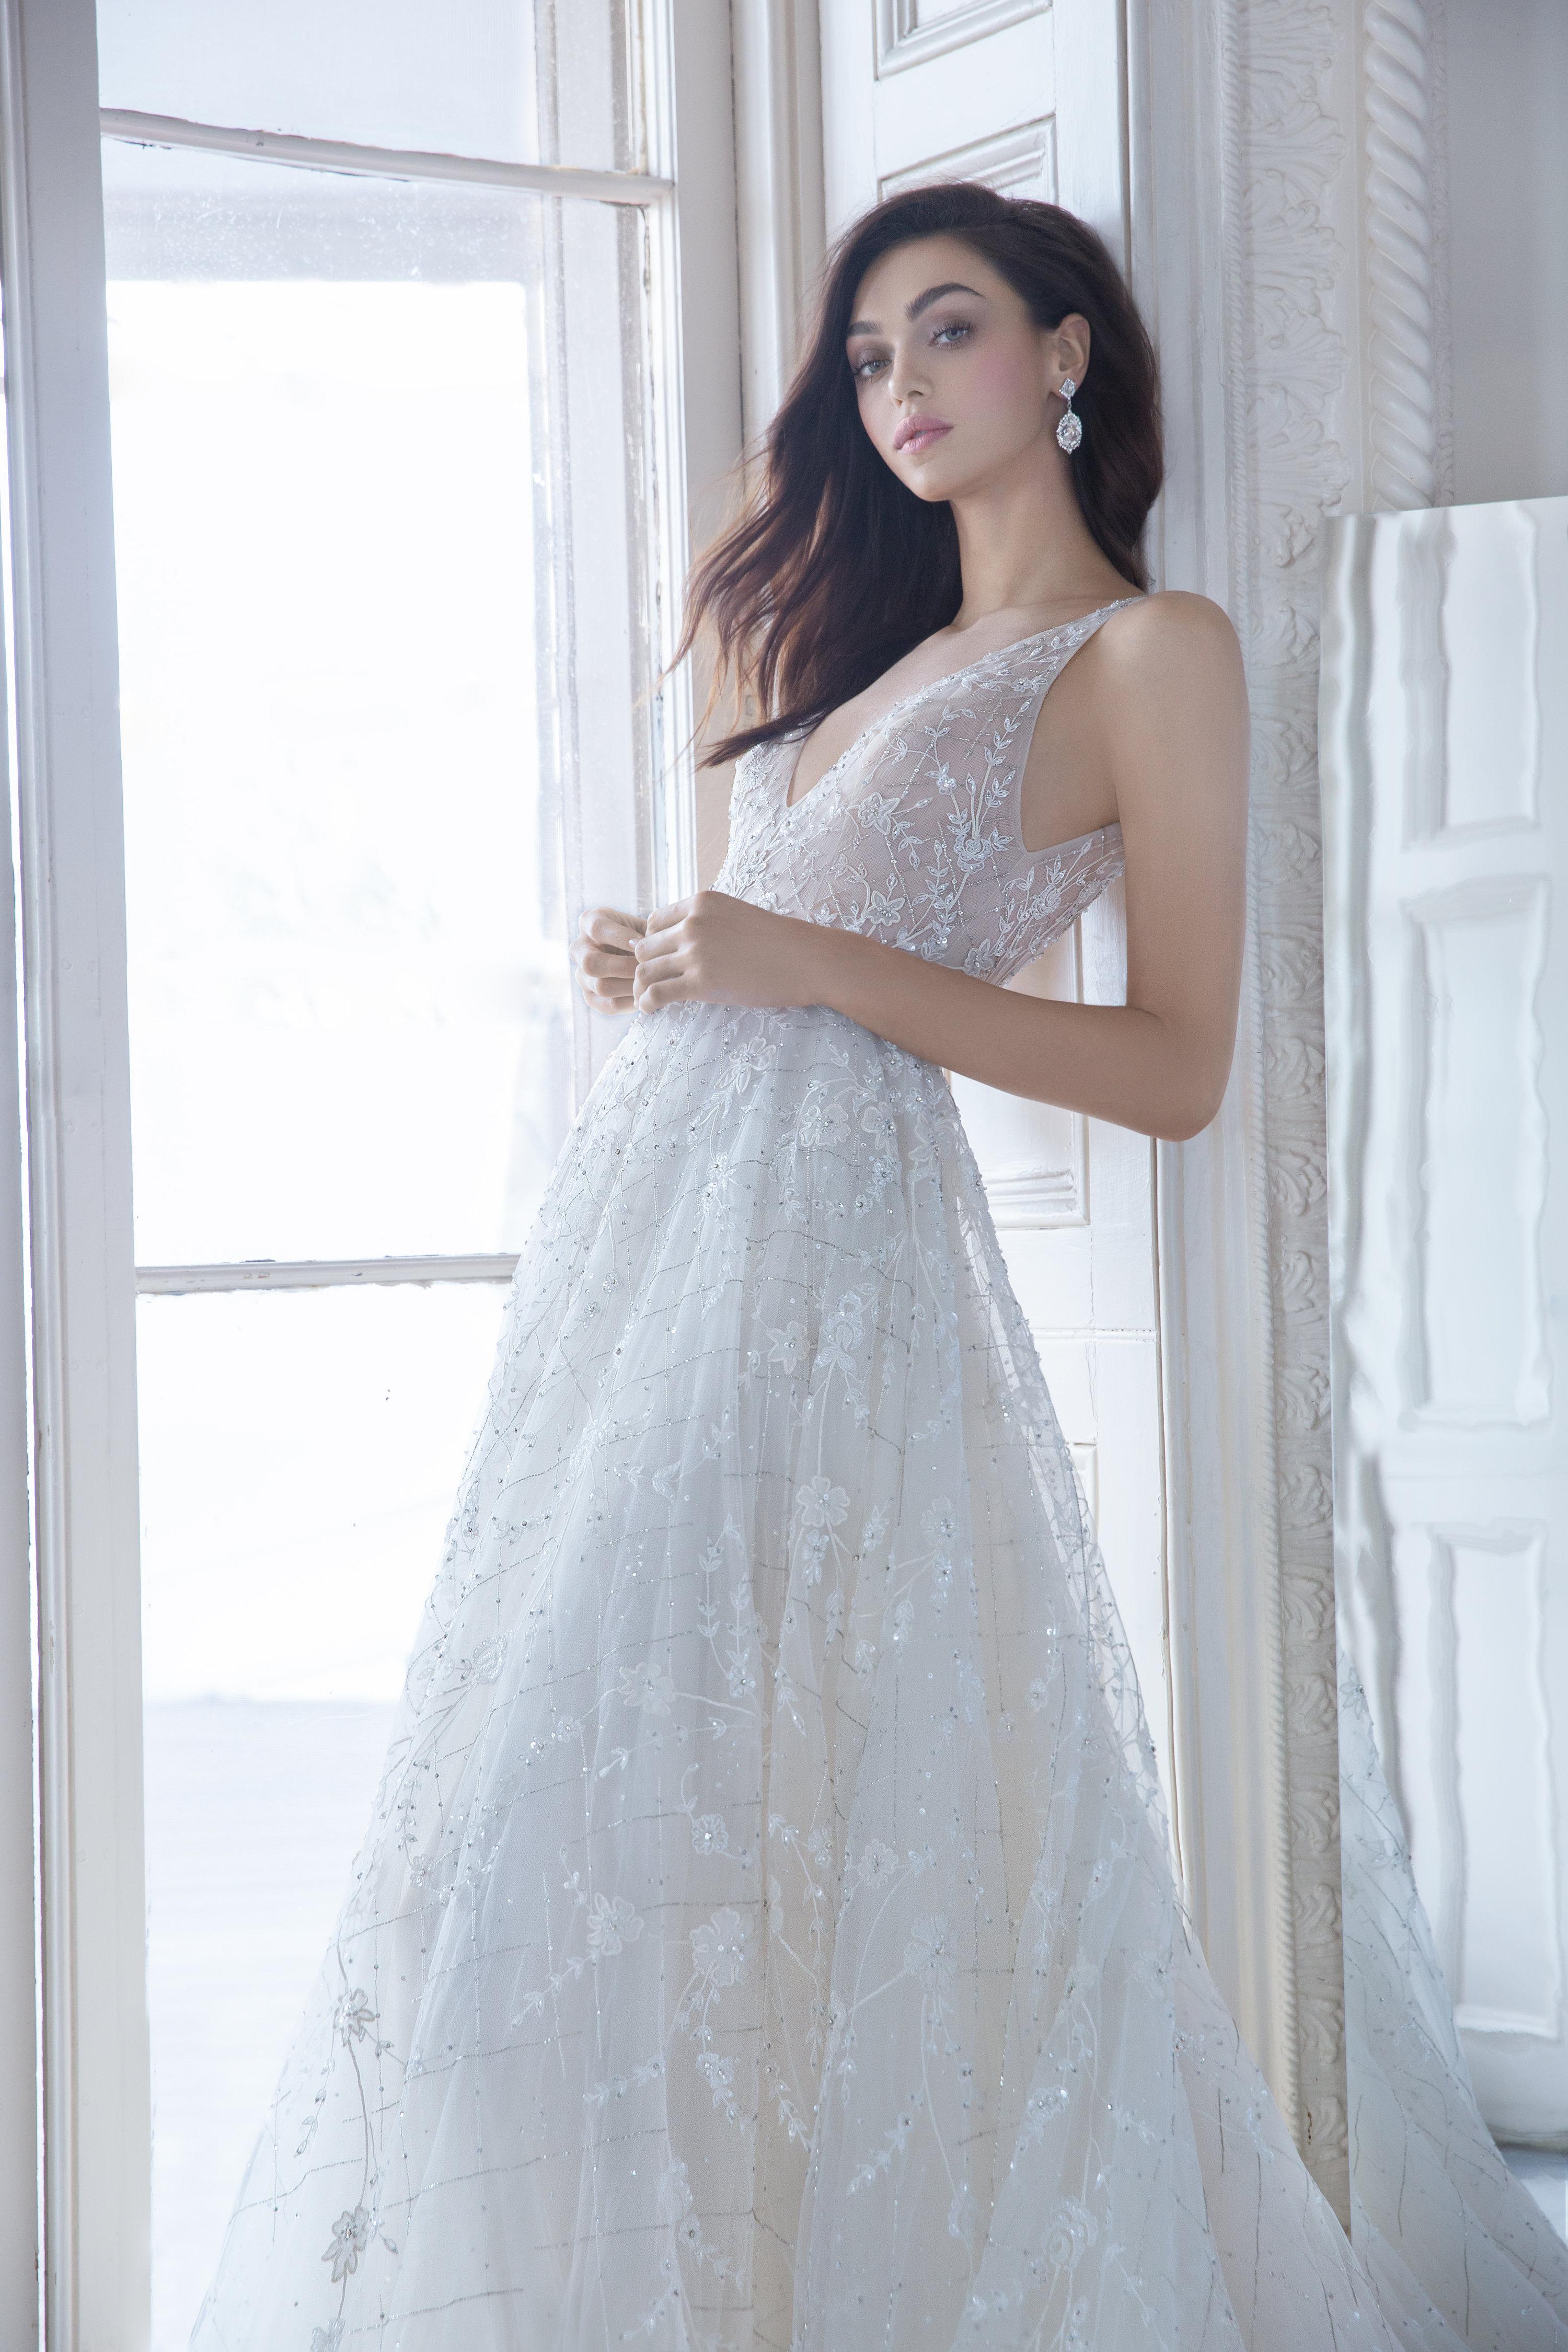 Fancy Lazaro Bridal Gowns Vignette - Wedding Dress Ideas ...